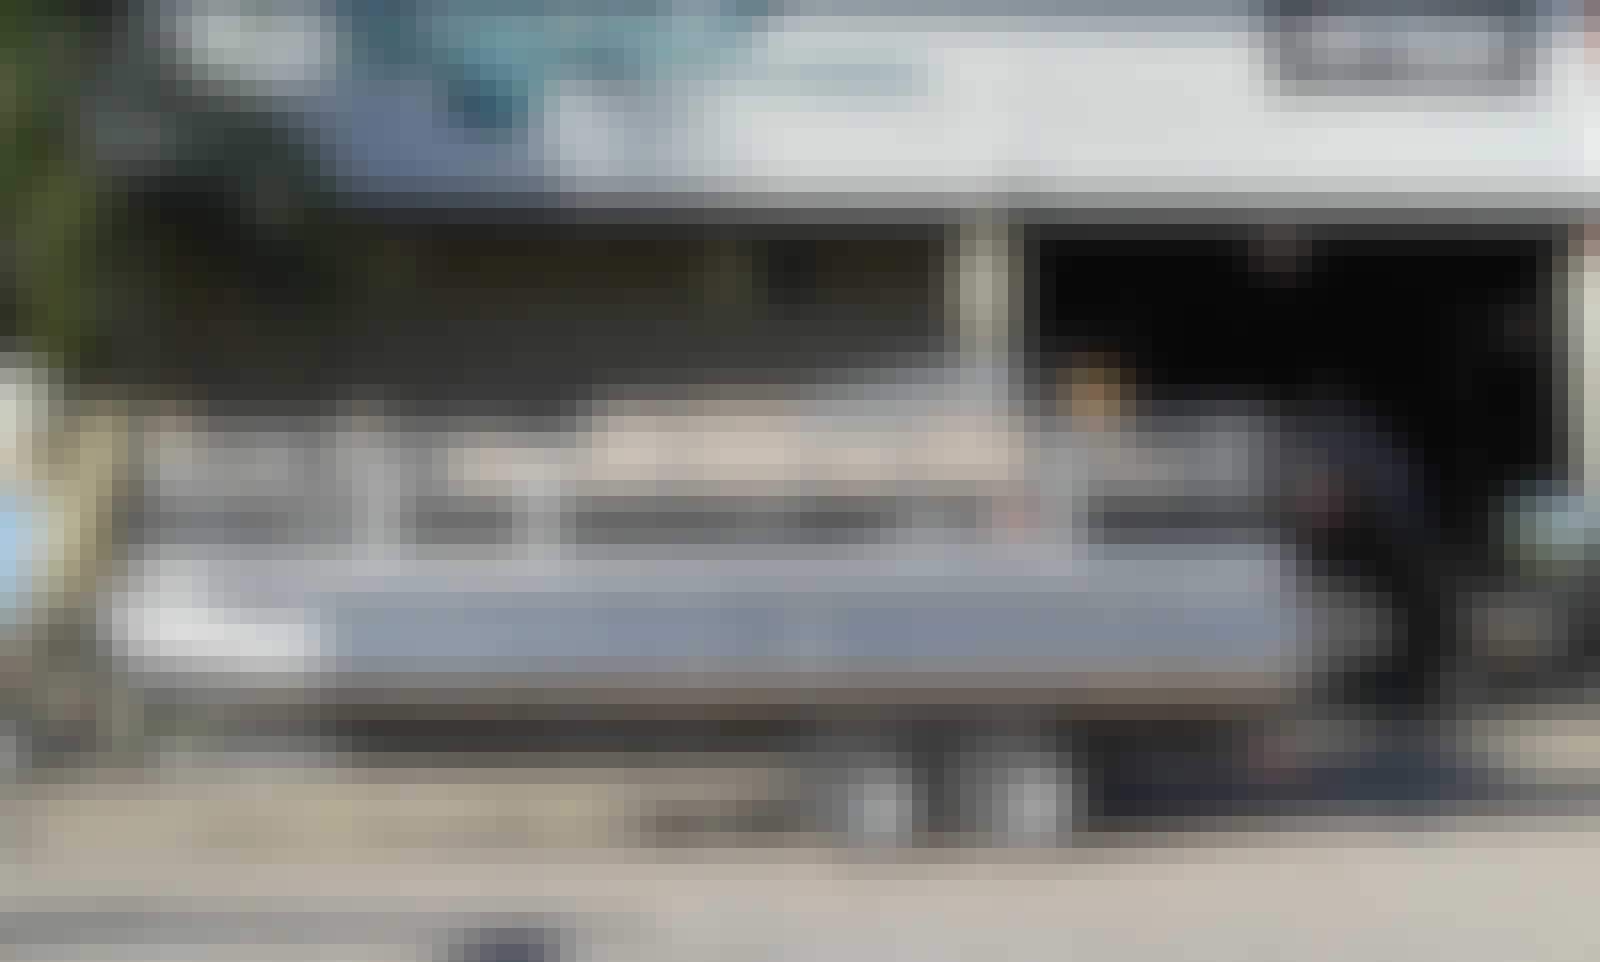 SunTracker Pontoon Boat Rental in Cape Coral, Florida